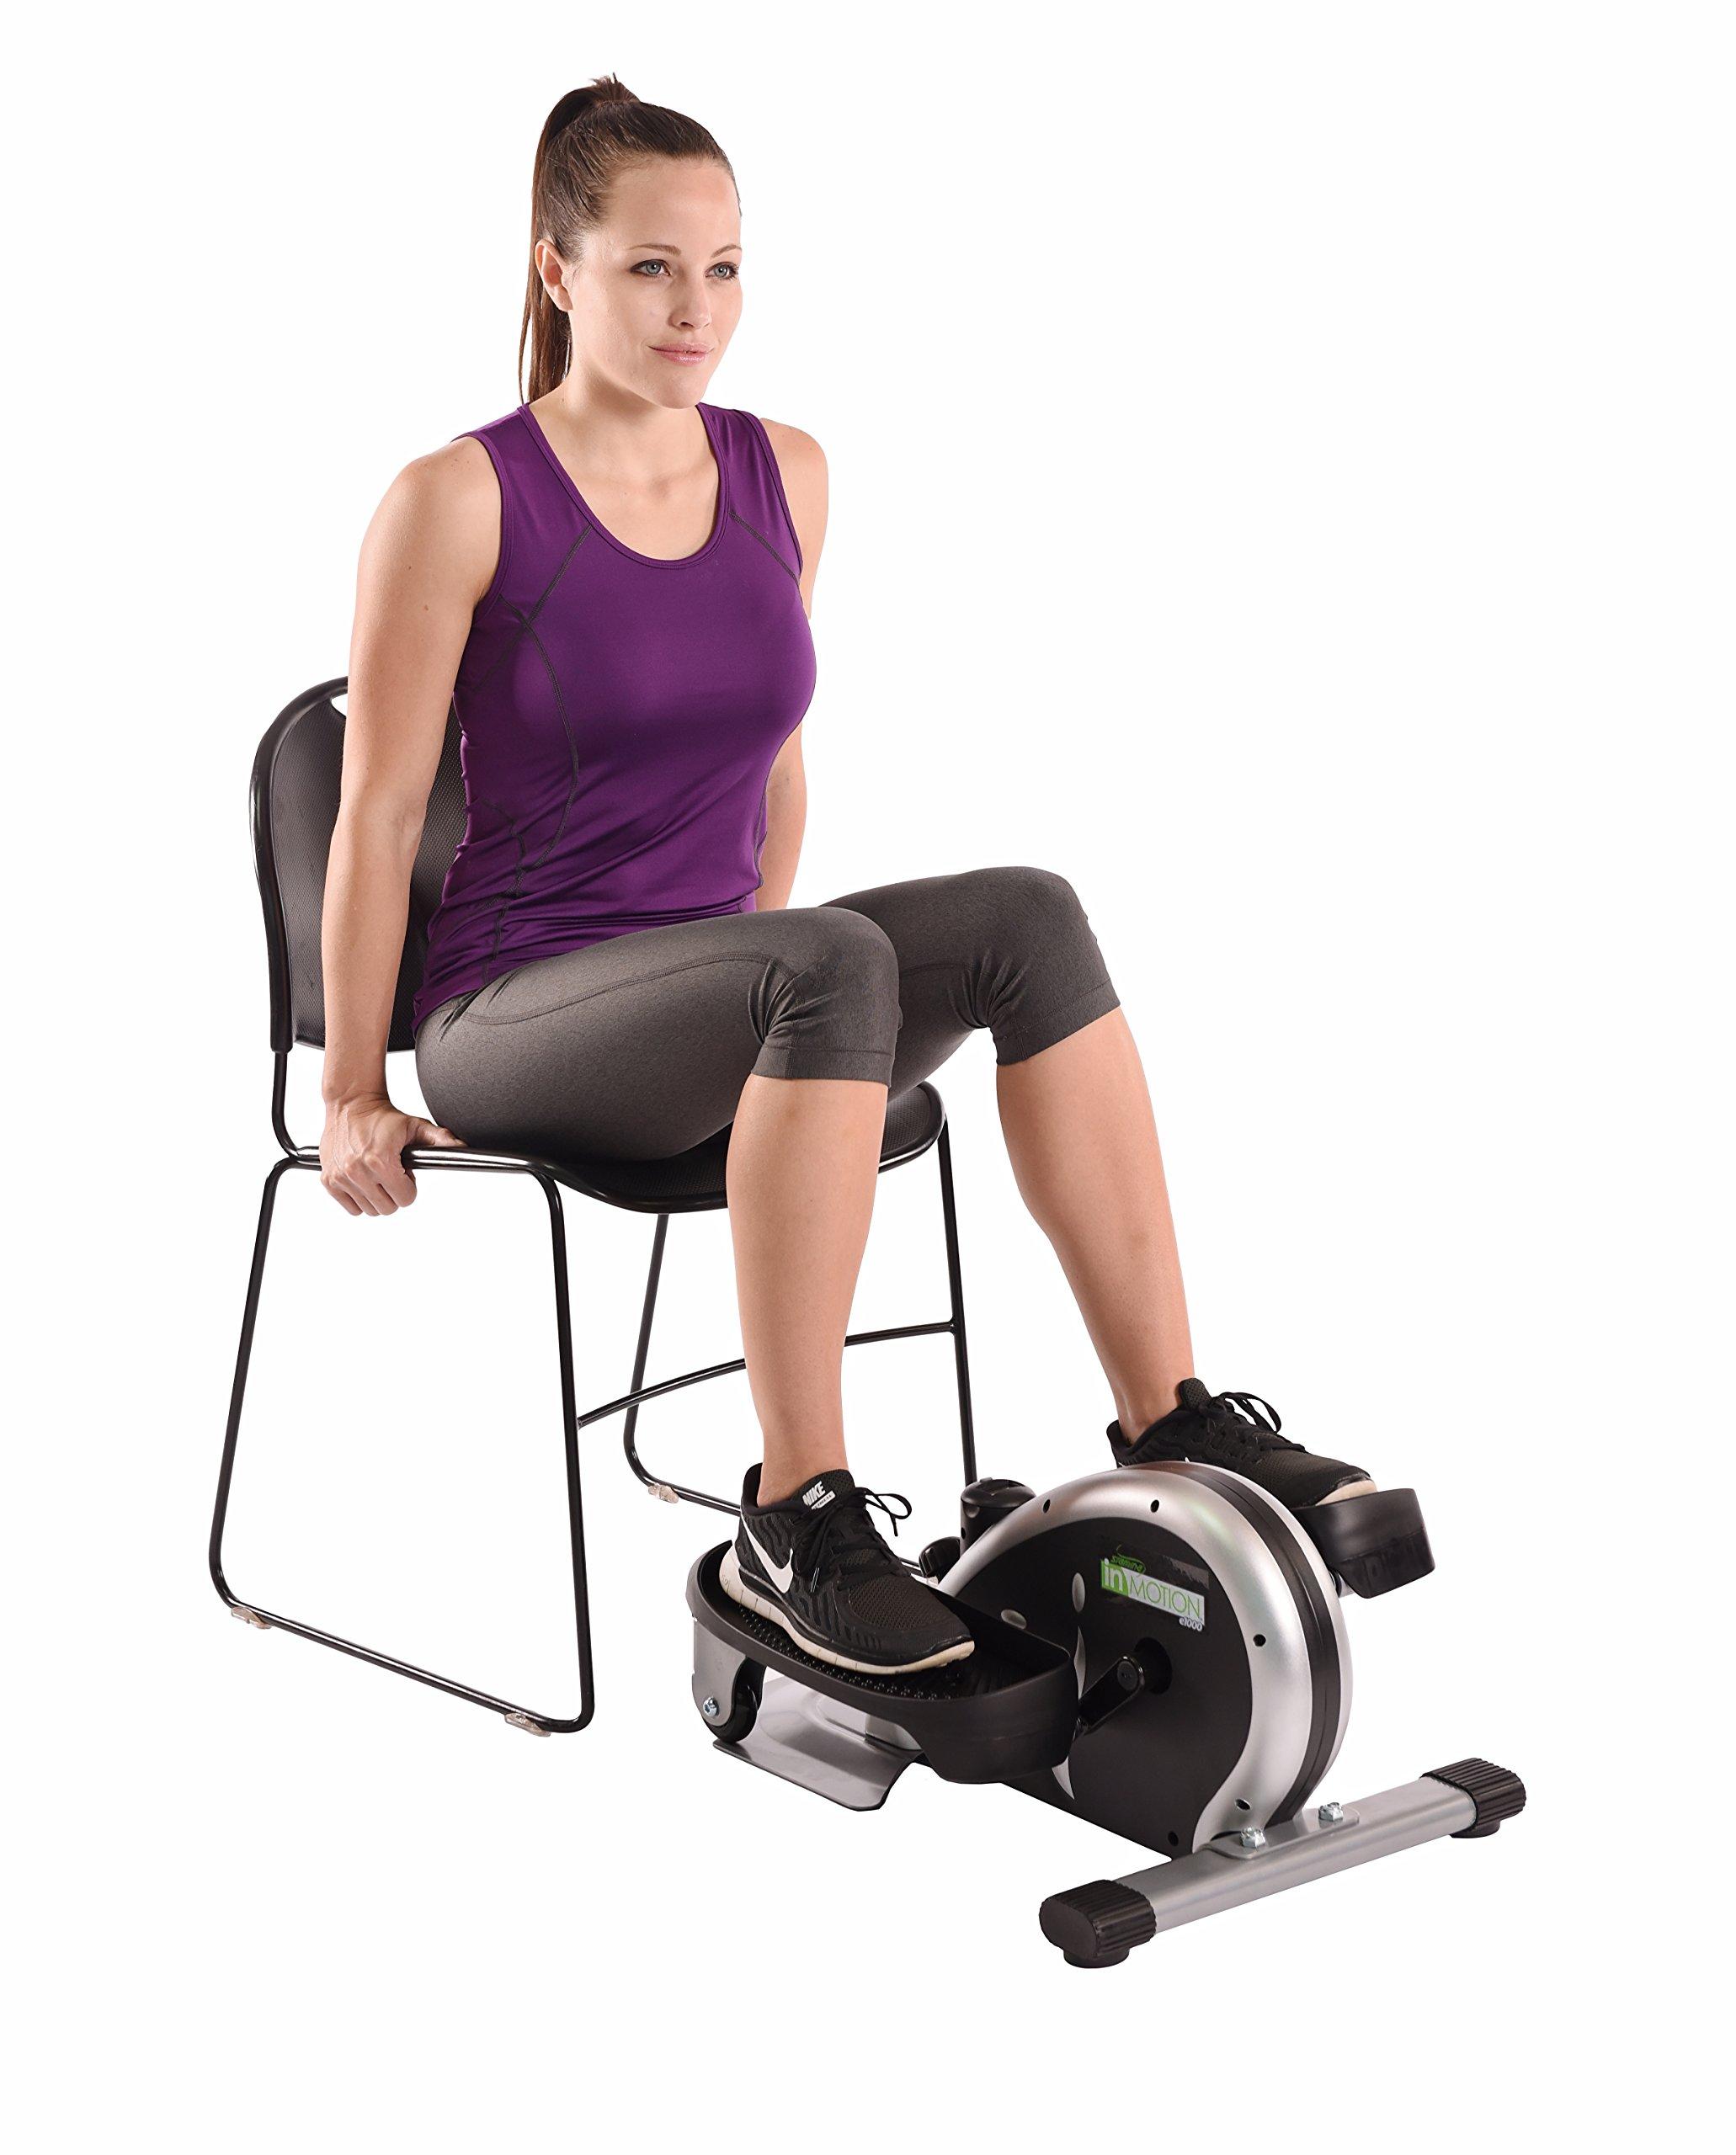 Stamina In Motion Elliptical Trainer